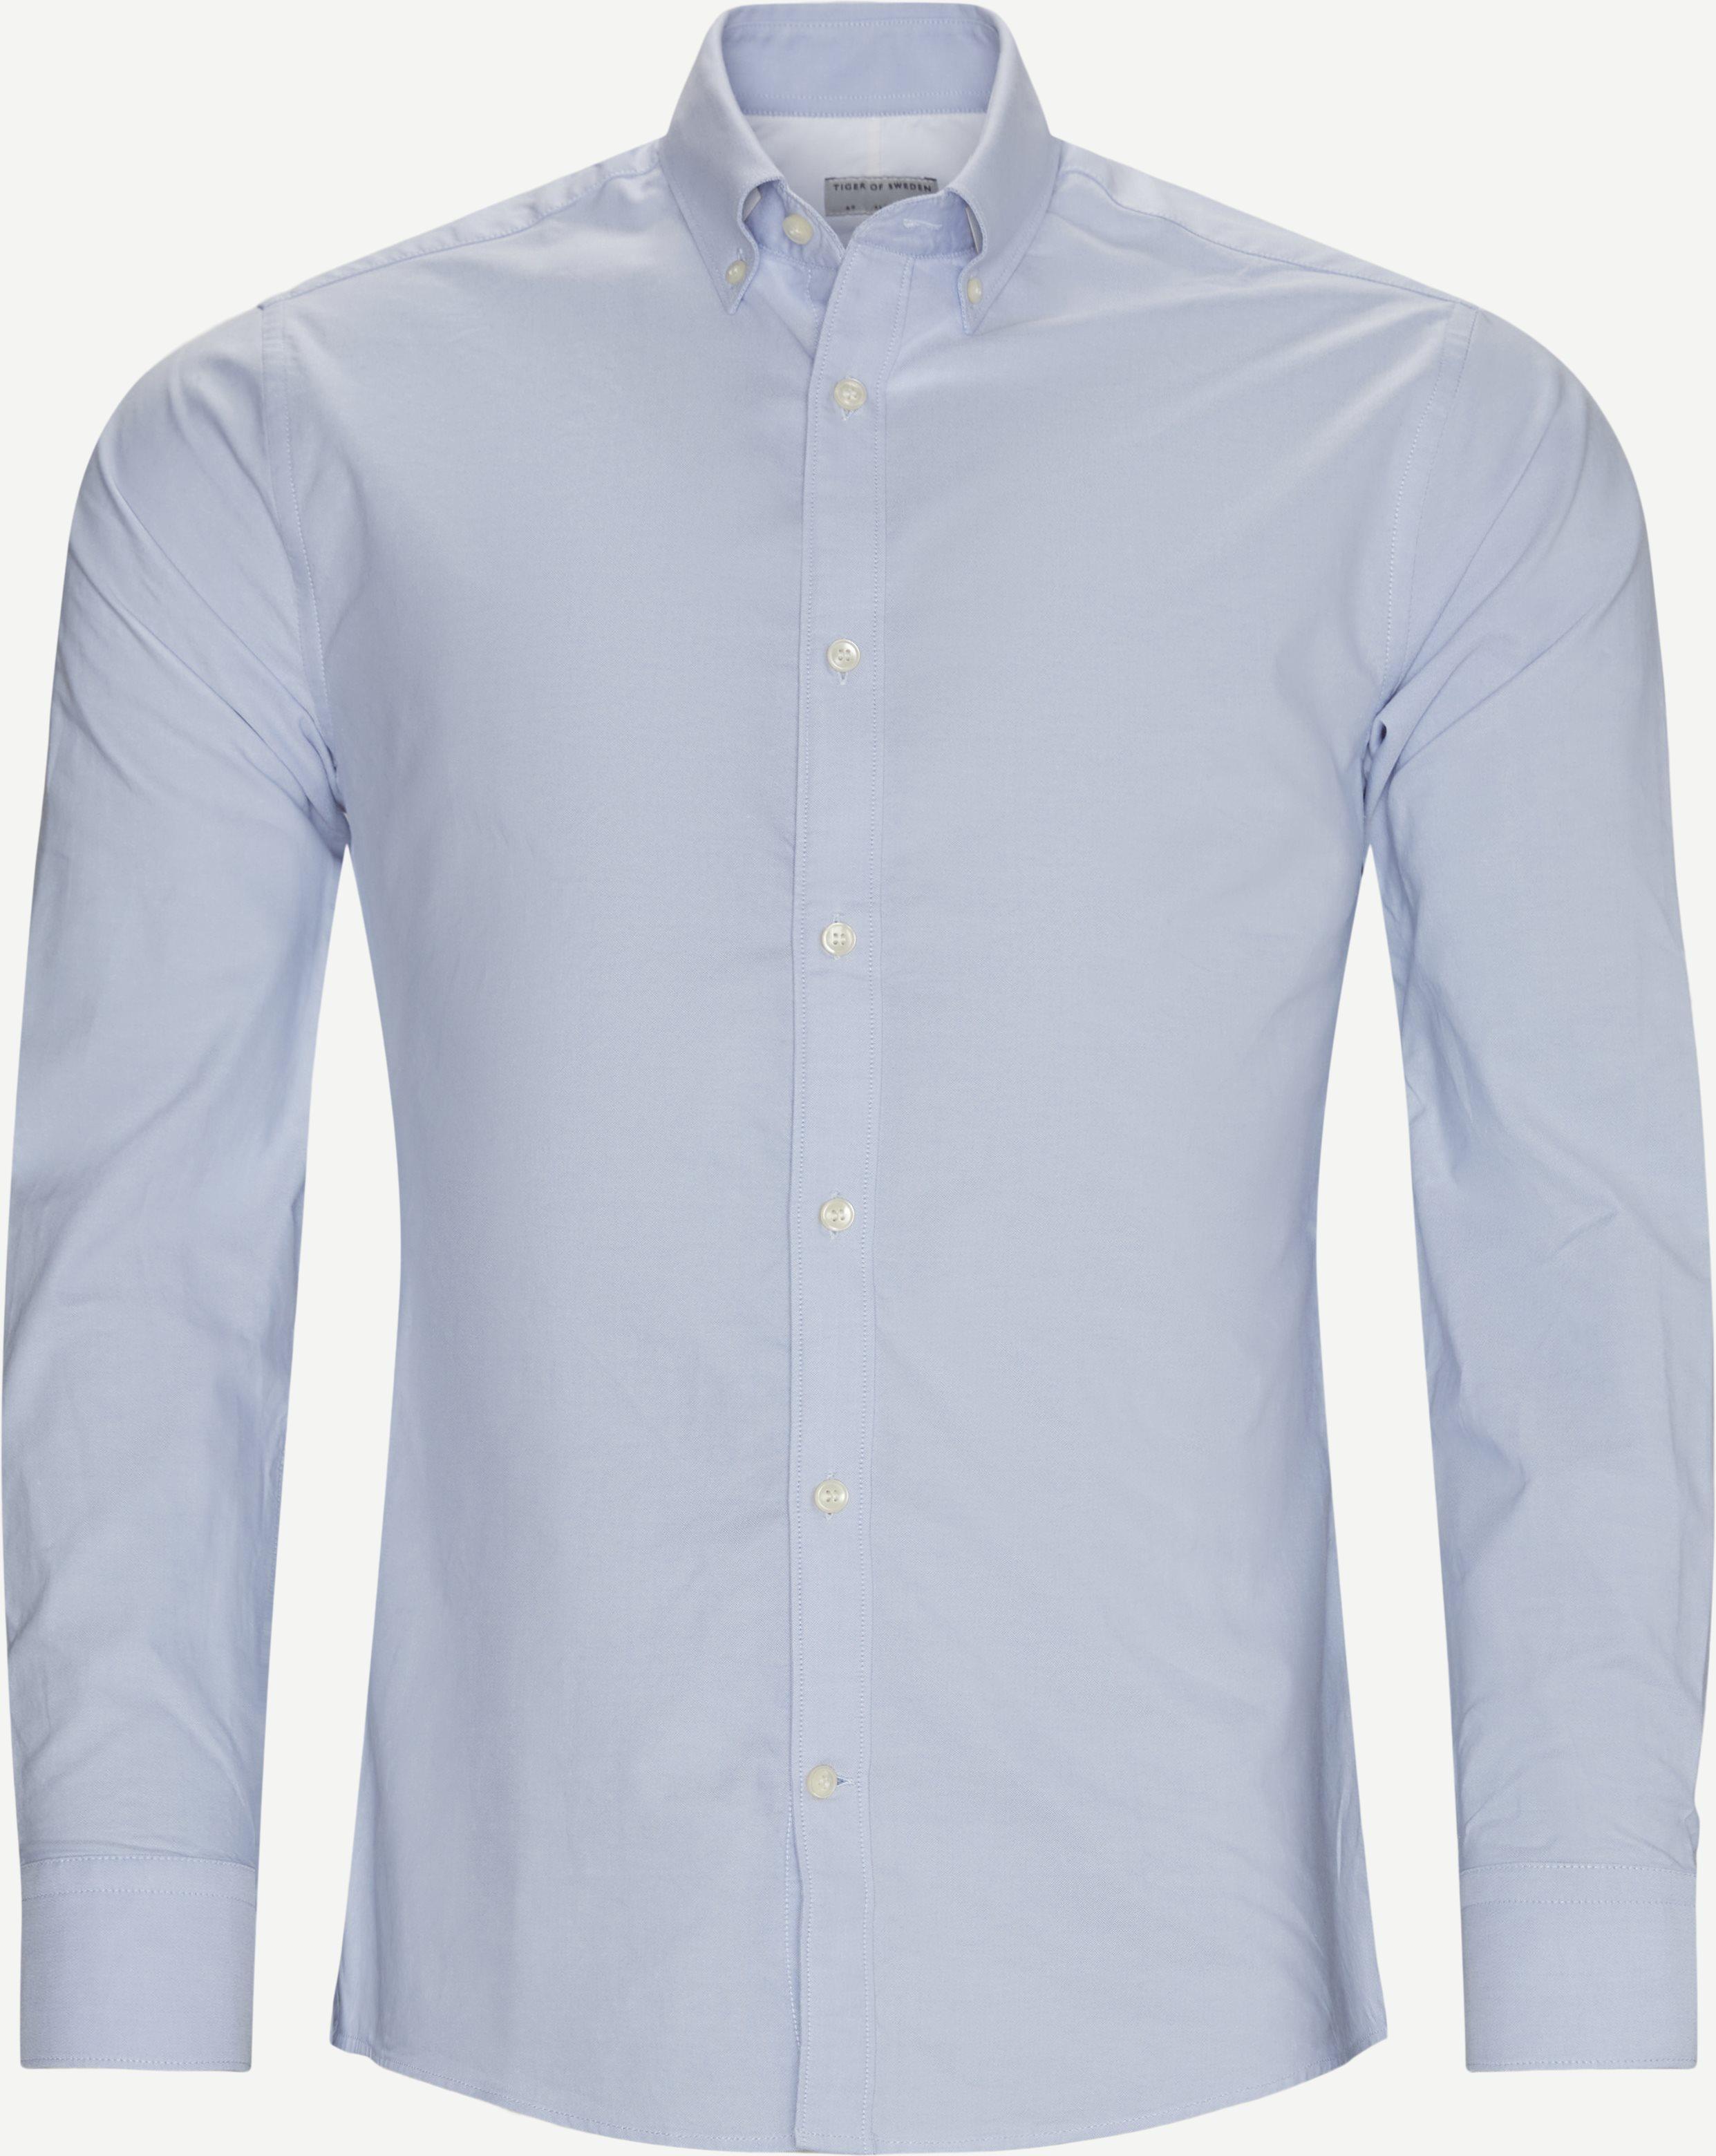 Fenald Skjorte - Shirts - Slim - Blue